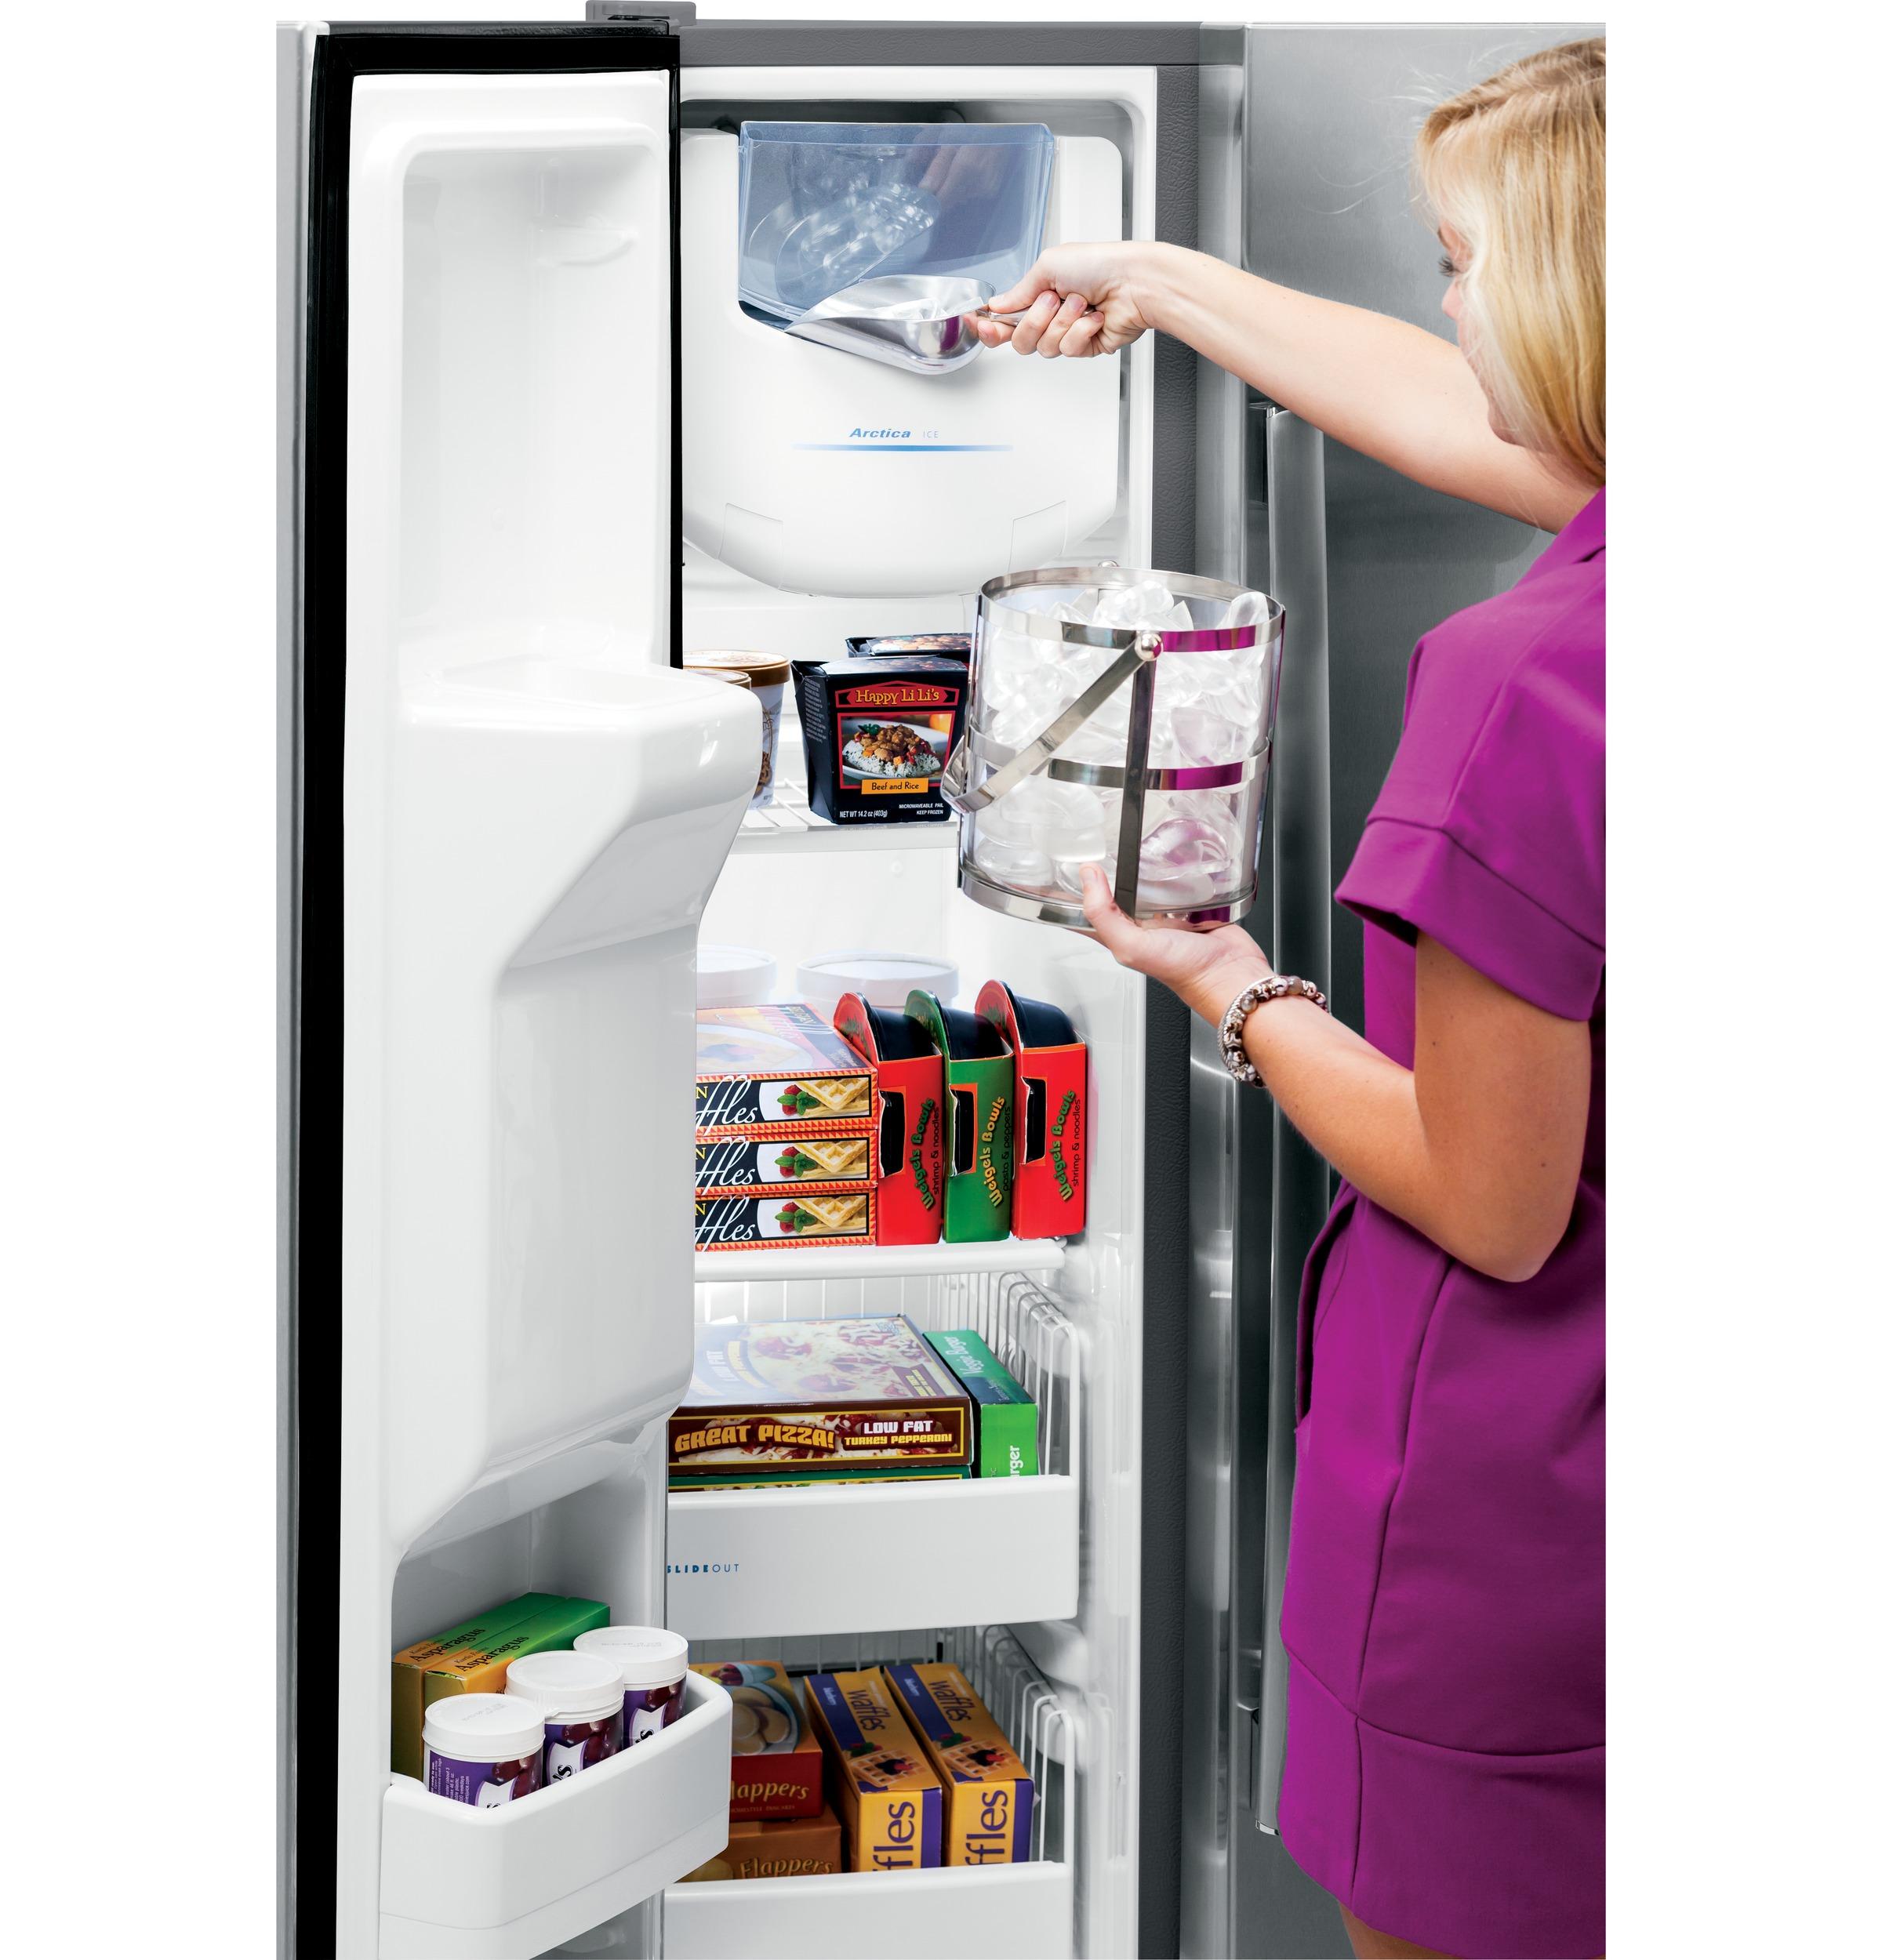 Model: PSE25KSHSS | GE Profile GE Profile™ Series ENERGY STAR® 25.3 Cu. Ft. Side-by-Side Refrigerator